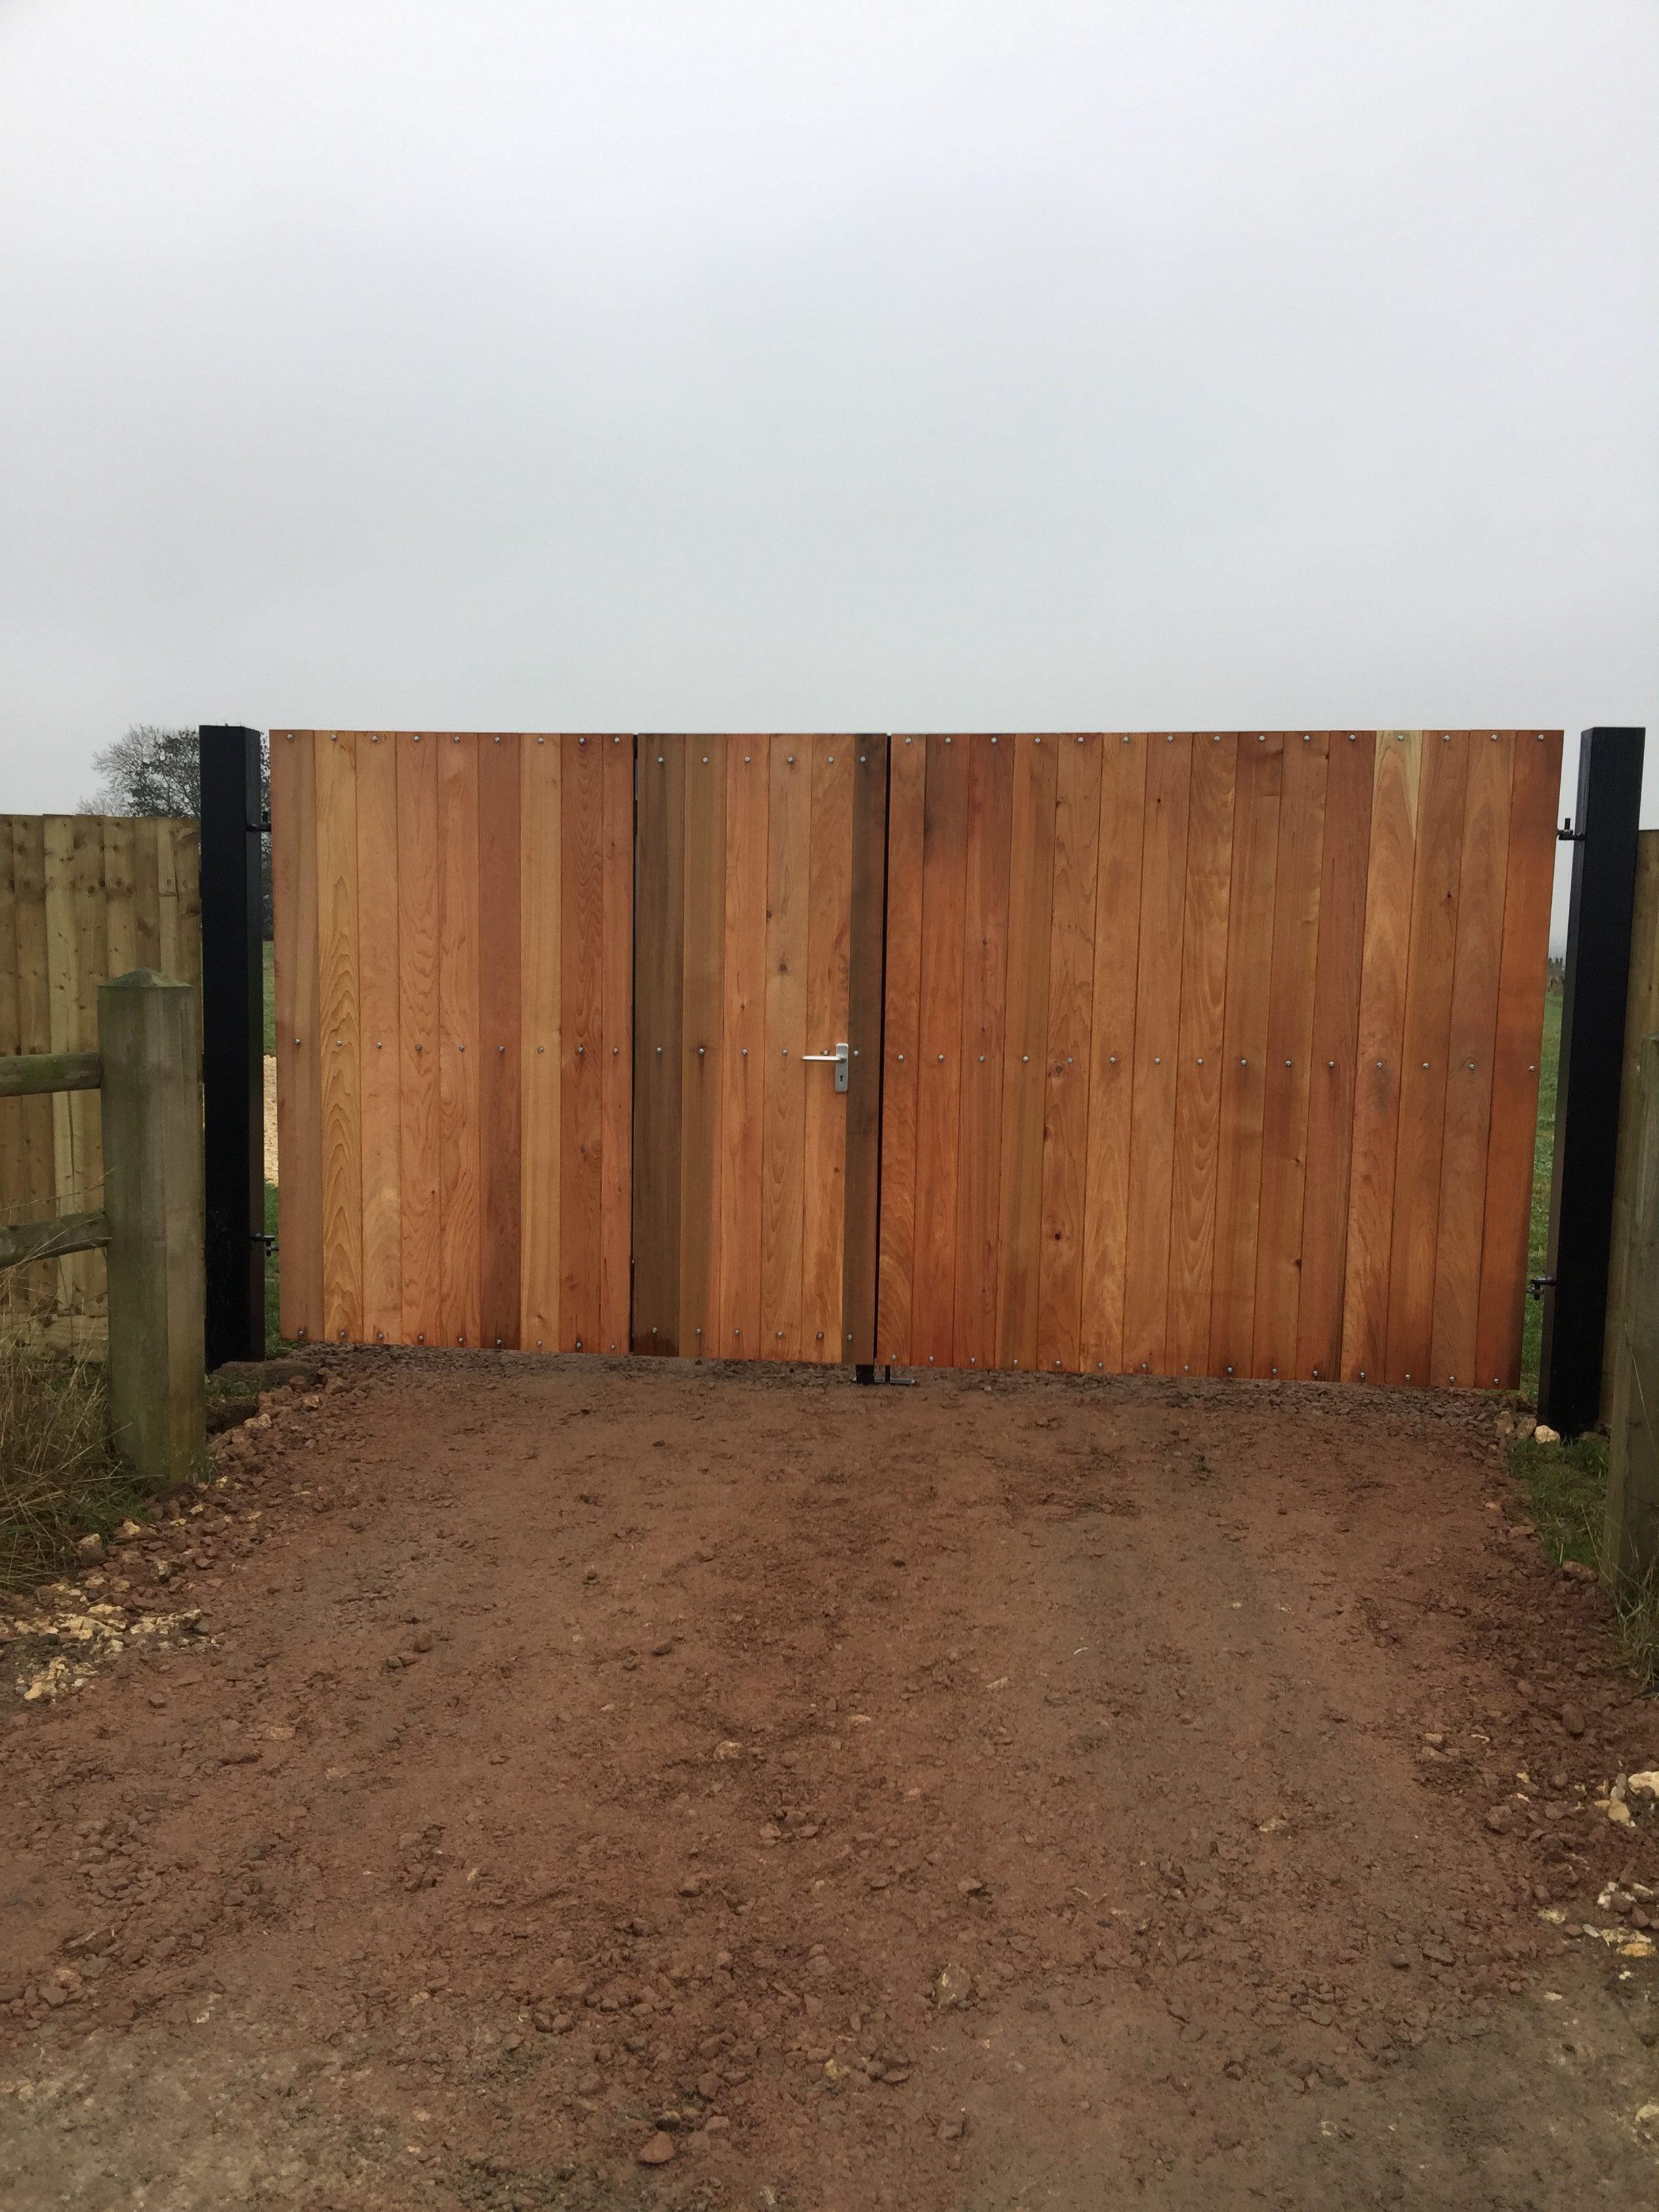 Automatic Gates Milton Keynes| Driveway,Electric Gates,Wooden,Garden ...